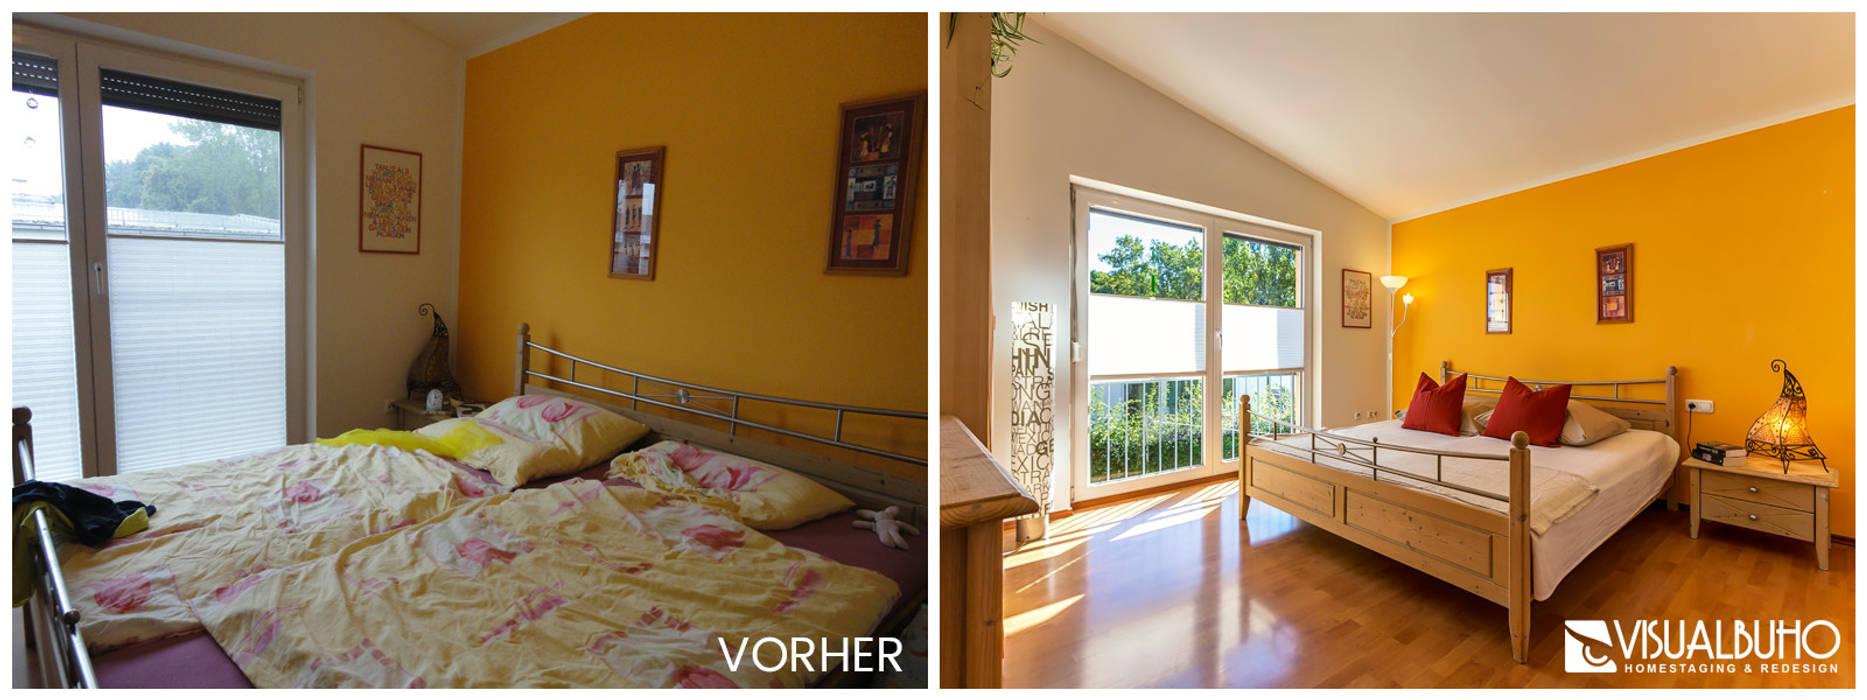 Awesome Schlafzimmer Vorher Nachher Images - Ivancernja.com ...